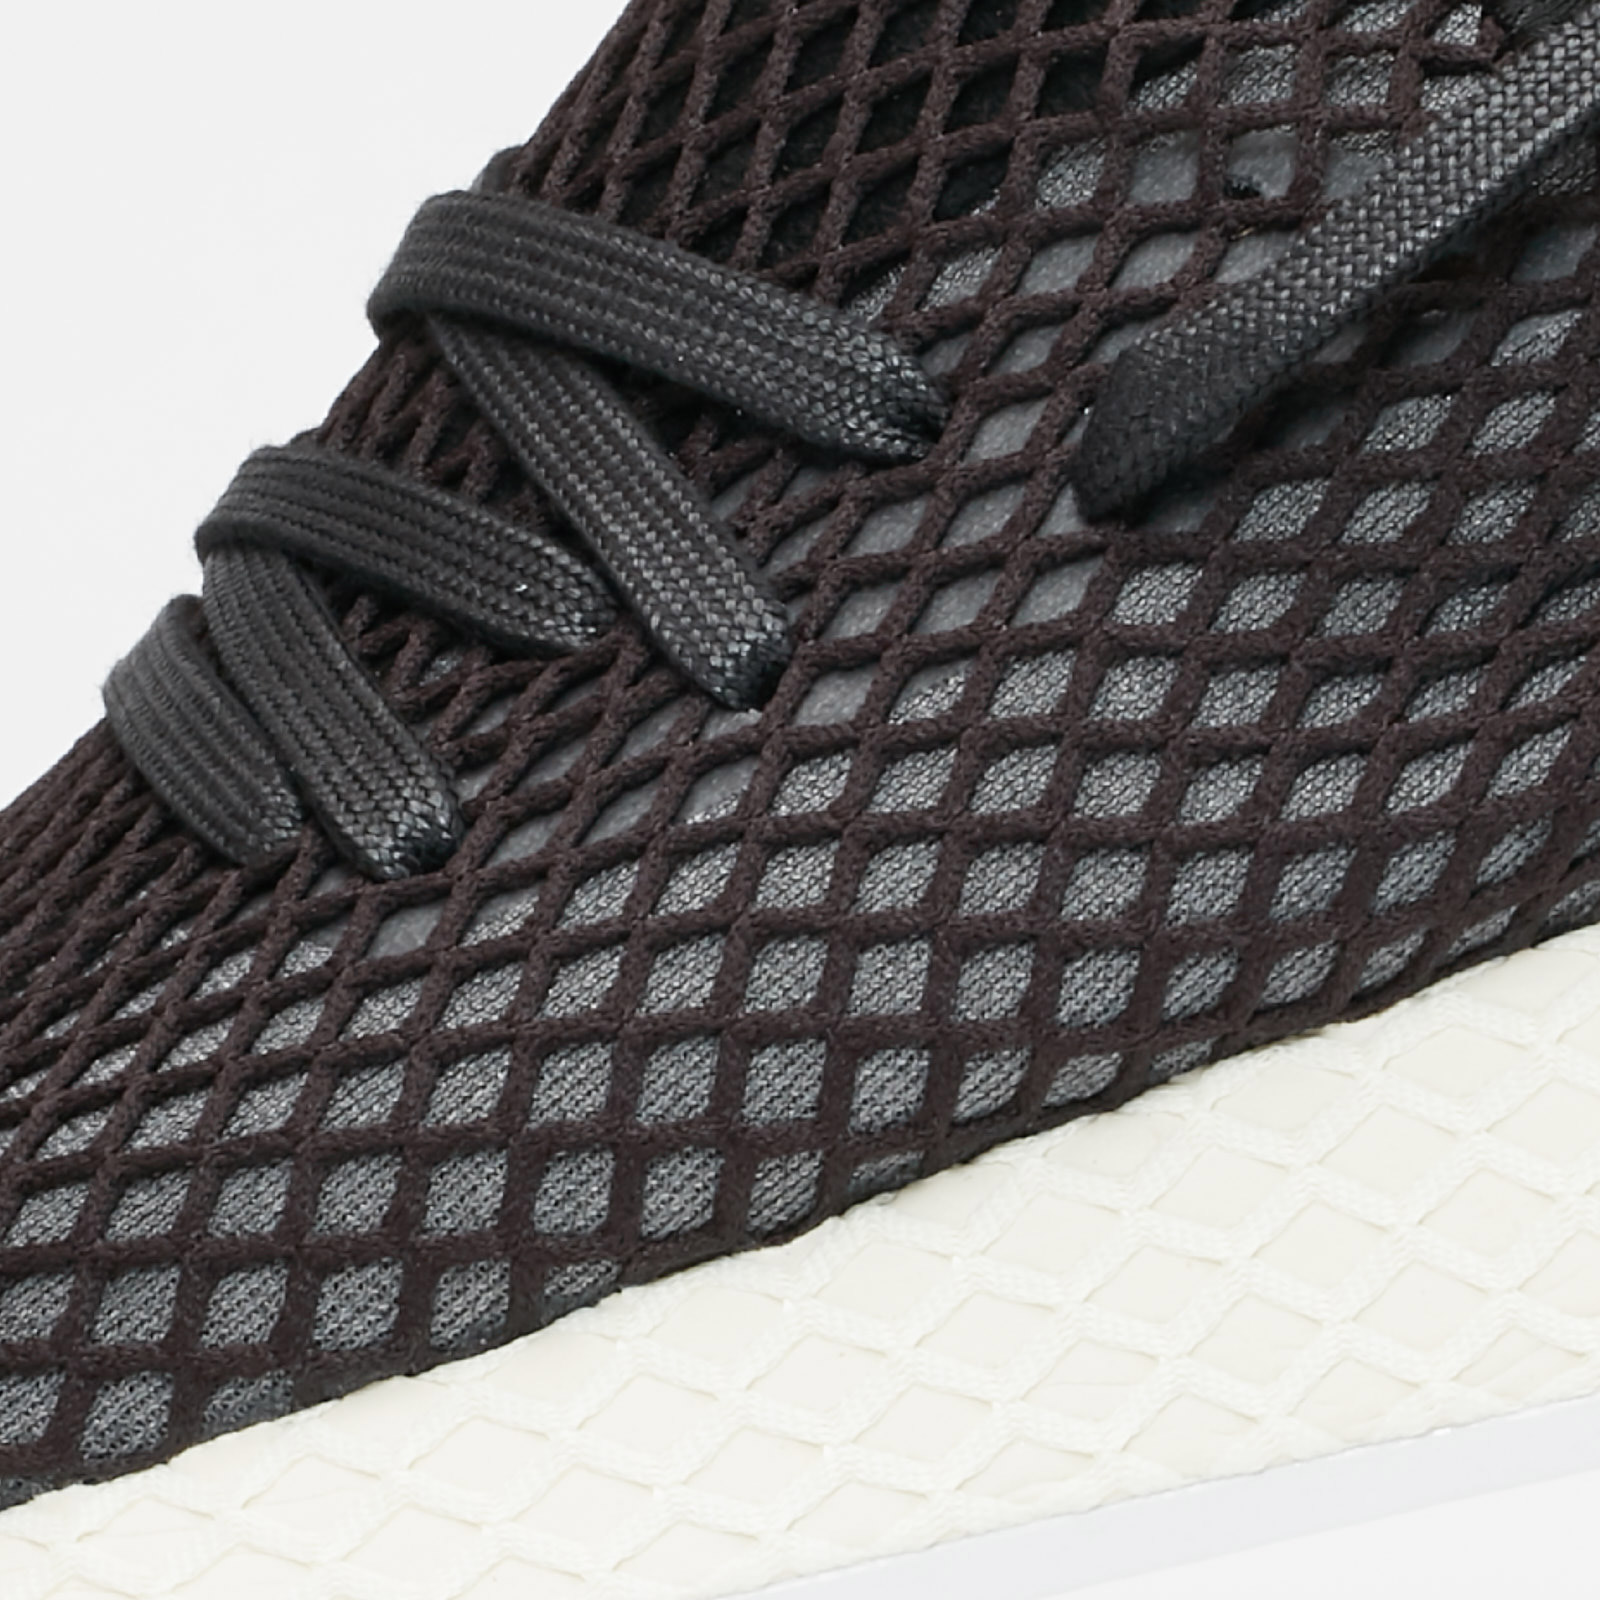 bf4288b57d211 adidas Deerupt - B41758 - Sneakersnstuff